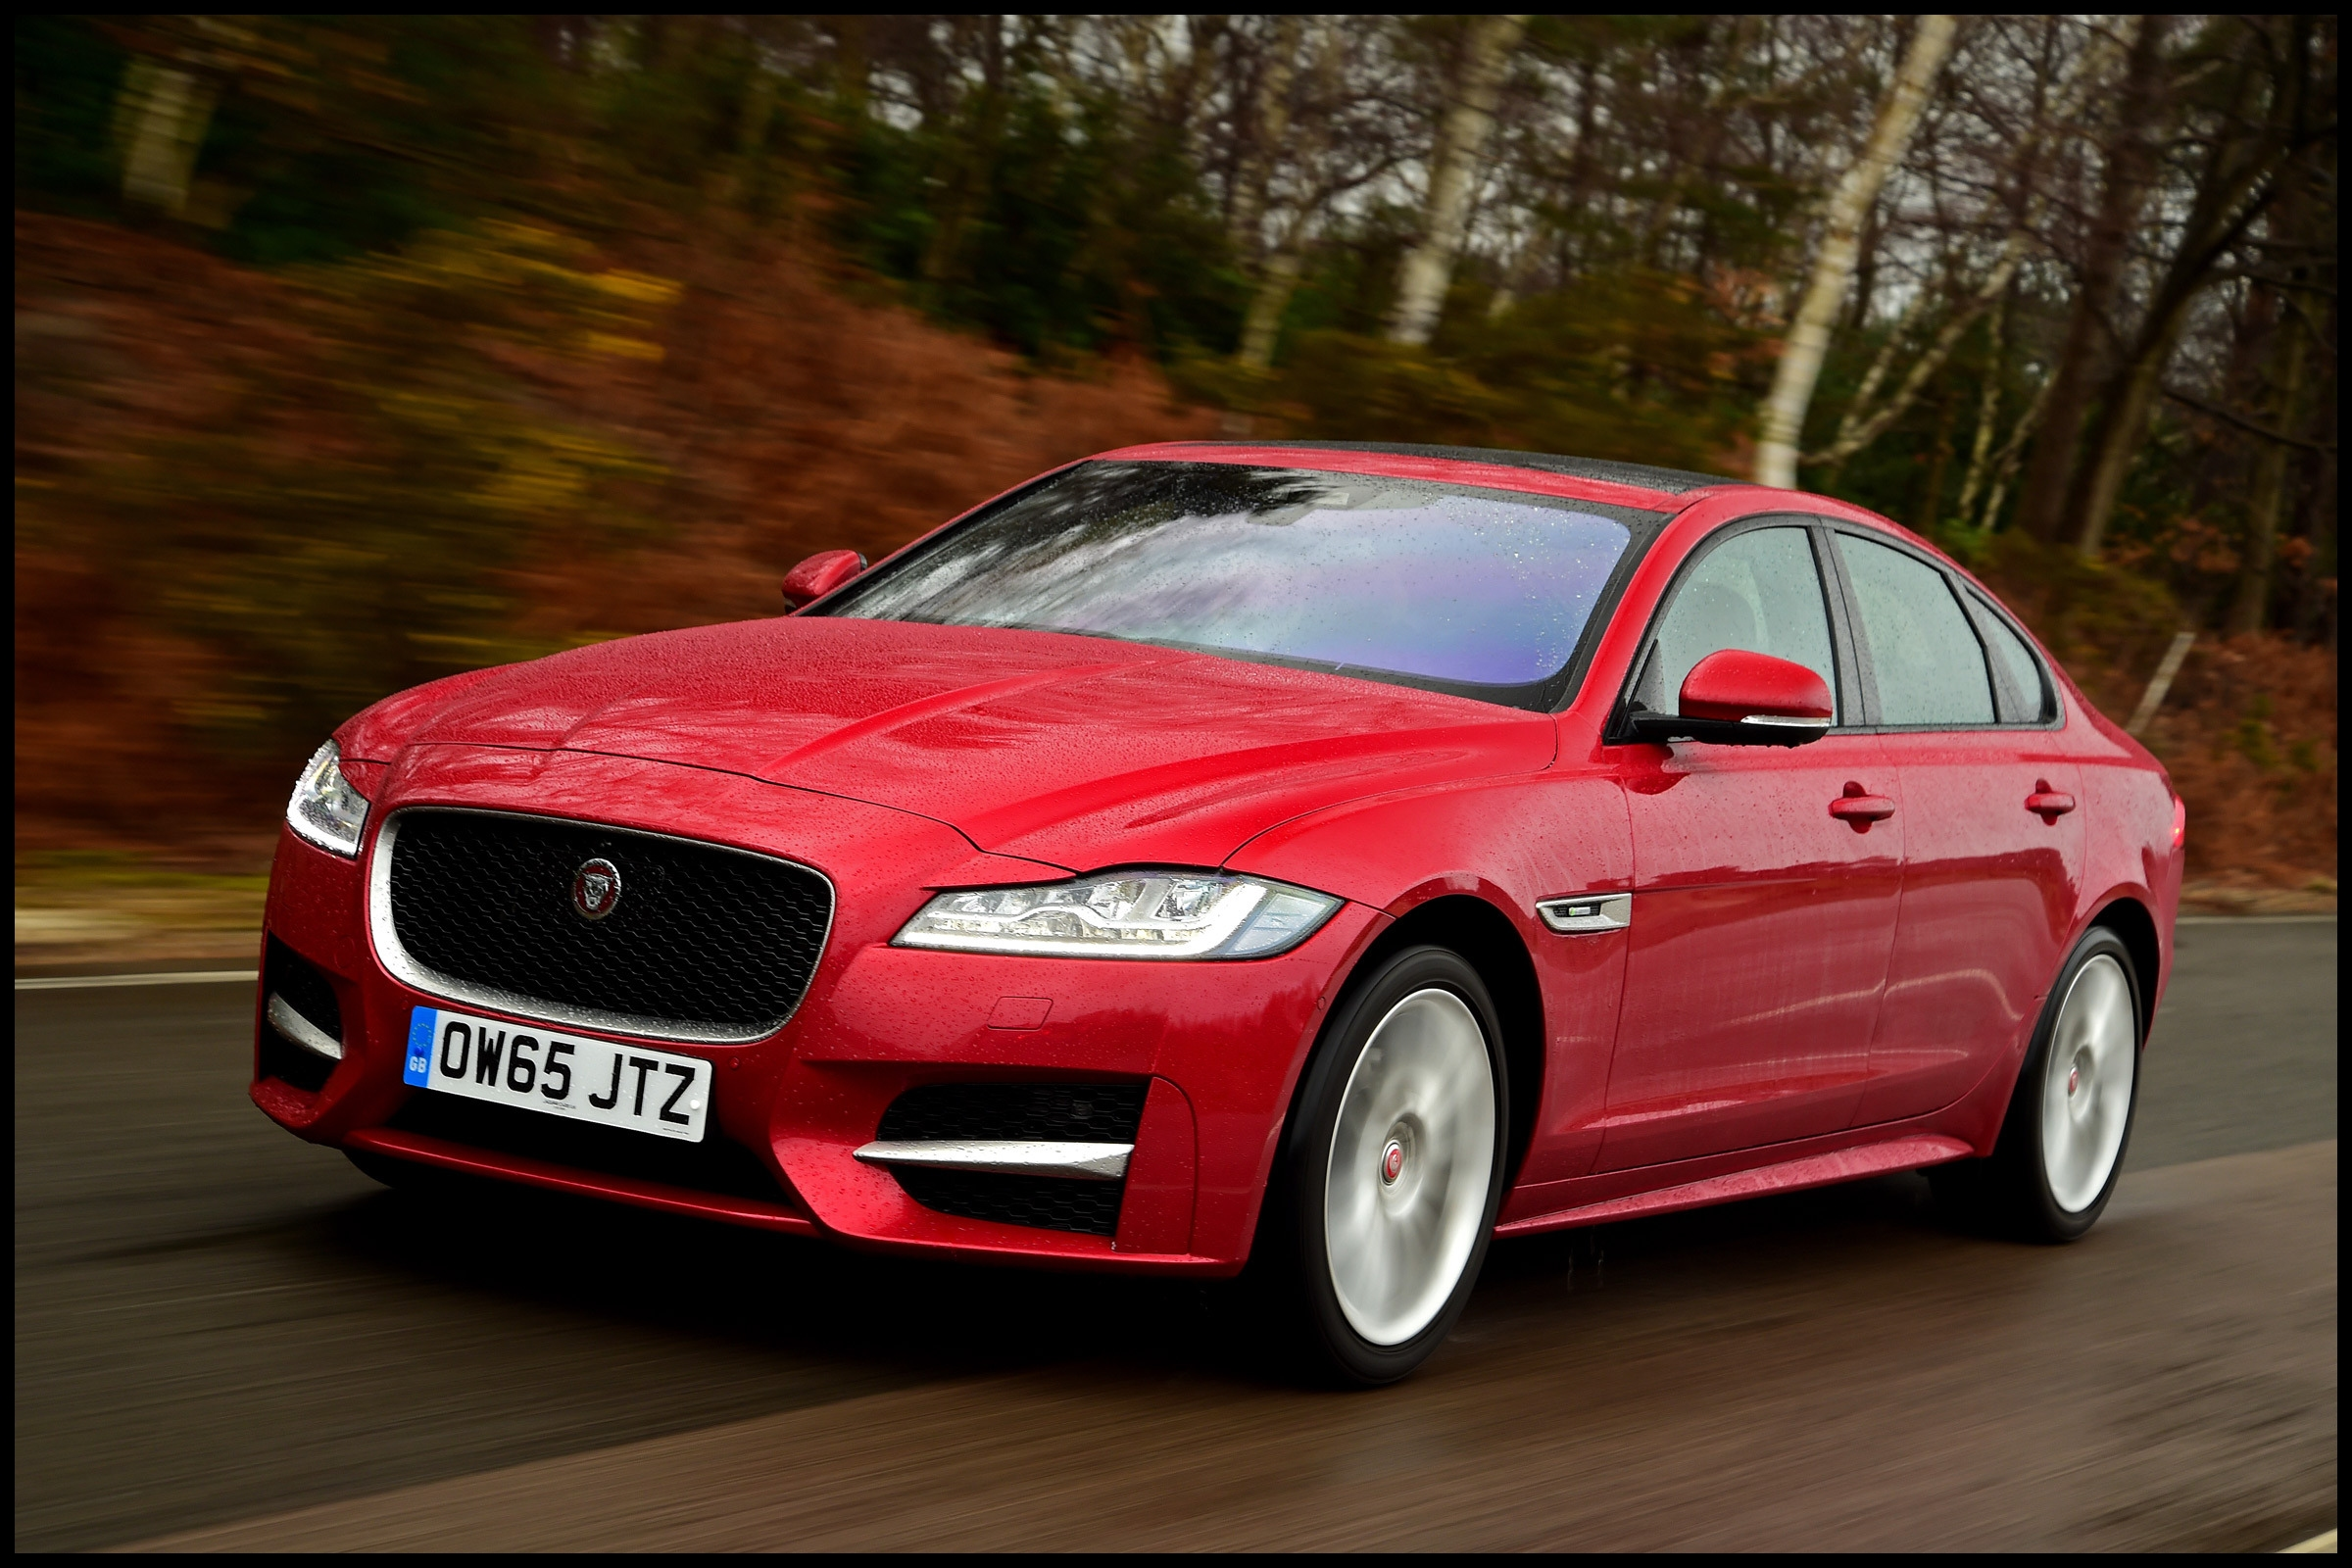 Electric Car Reviews Uk New Jaguar Xf 2 0d Awd 2016 Review